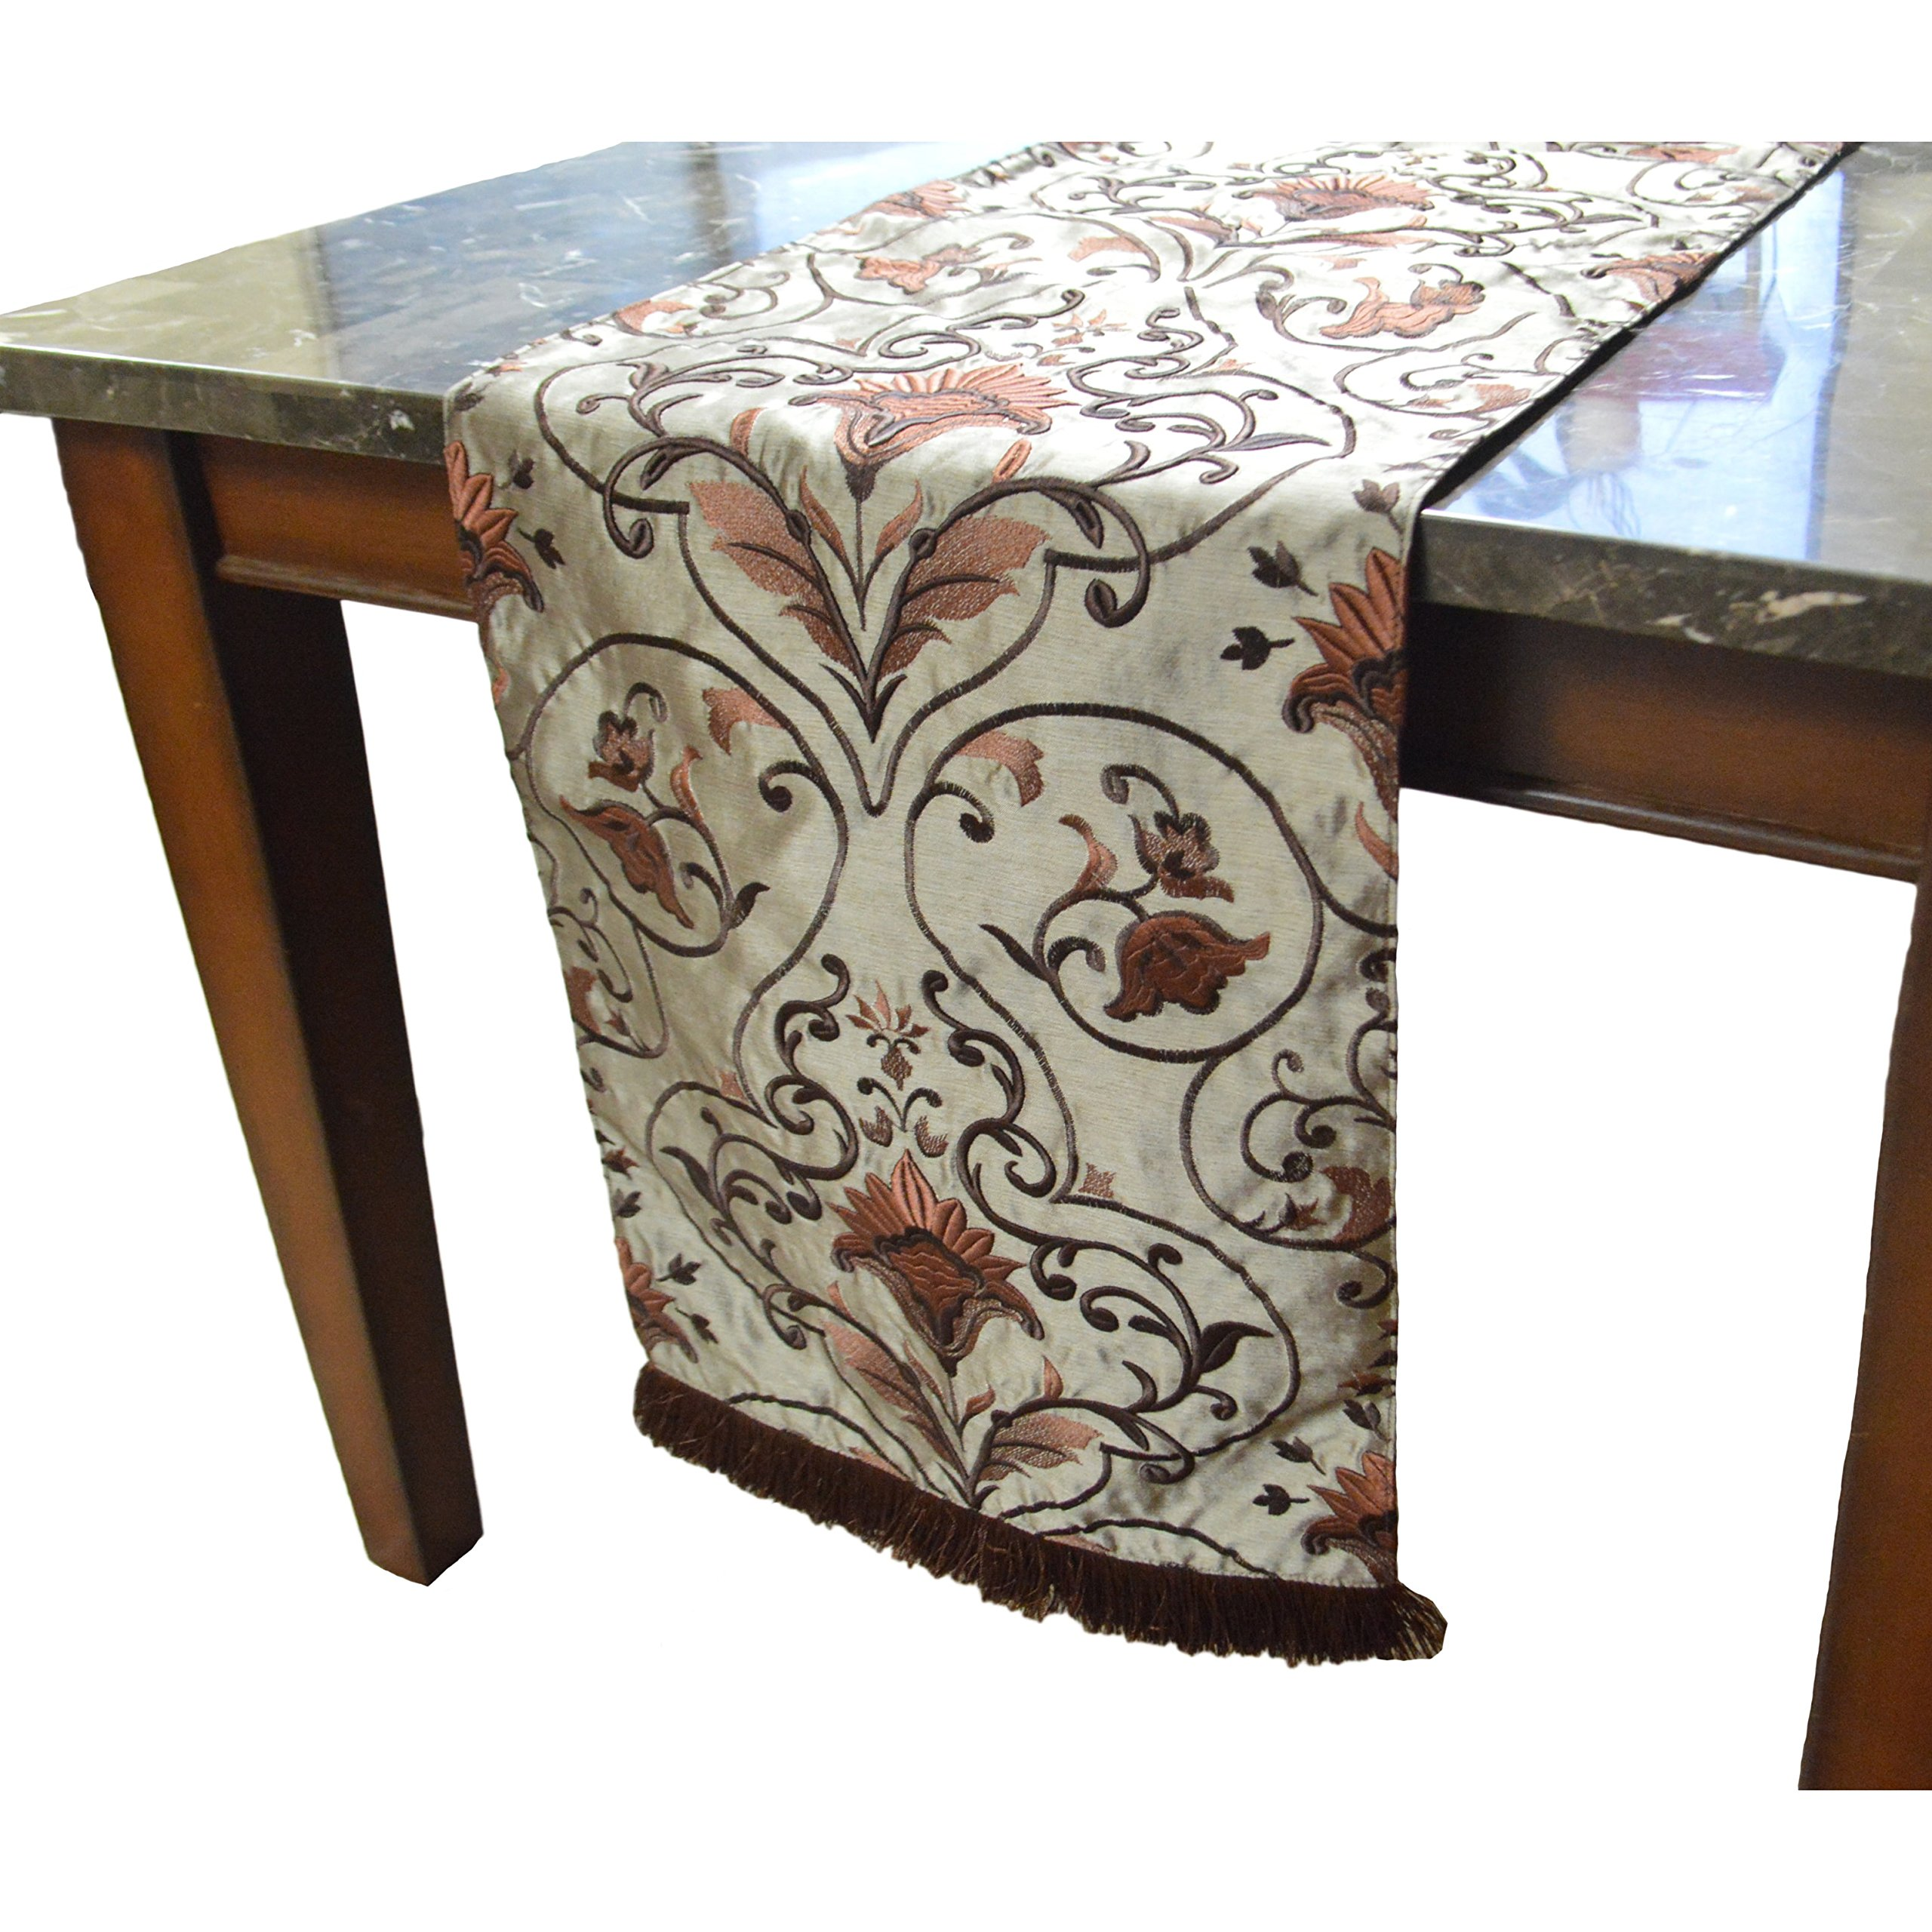 Canaan Company Claudia Decorative Table Runner 16 x 108